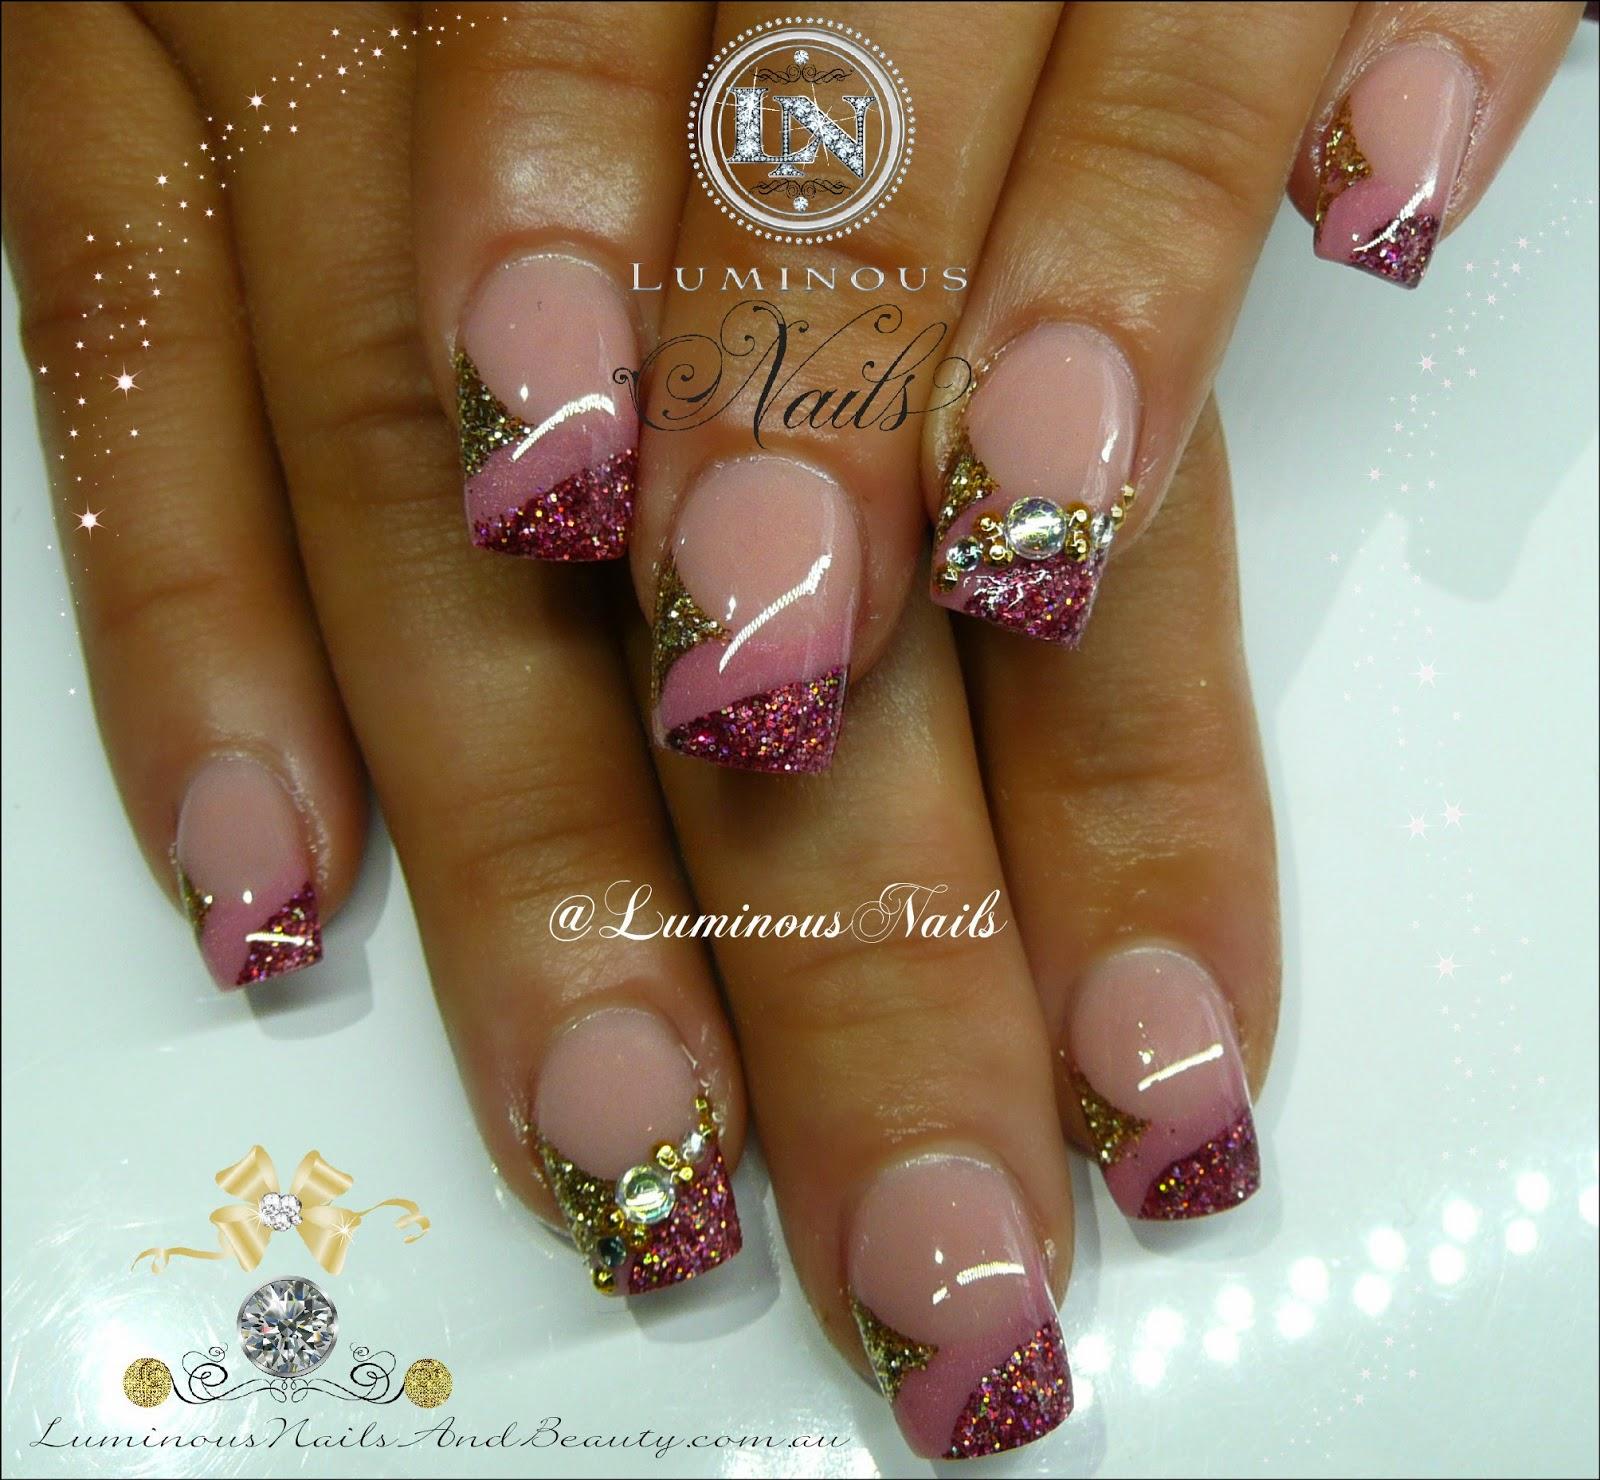 Pink white and silver nail designs images nail art and nail pink white and silver nail designs gallery nail art and nail blue white and silver nail prinsesfo Choice Image